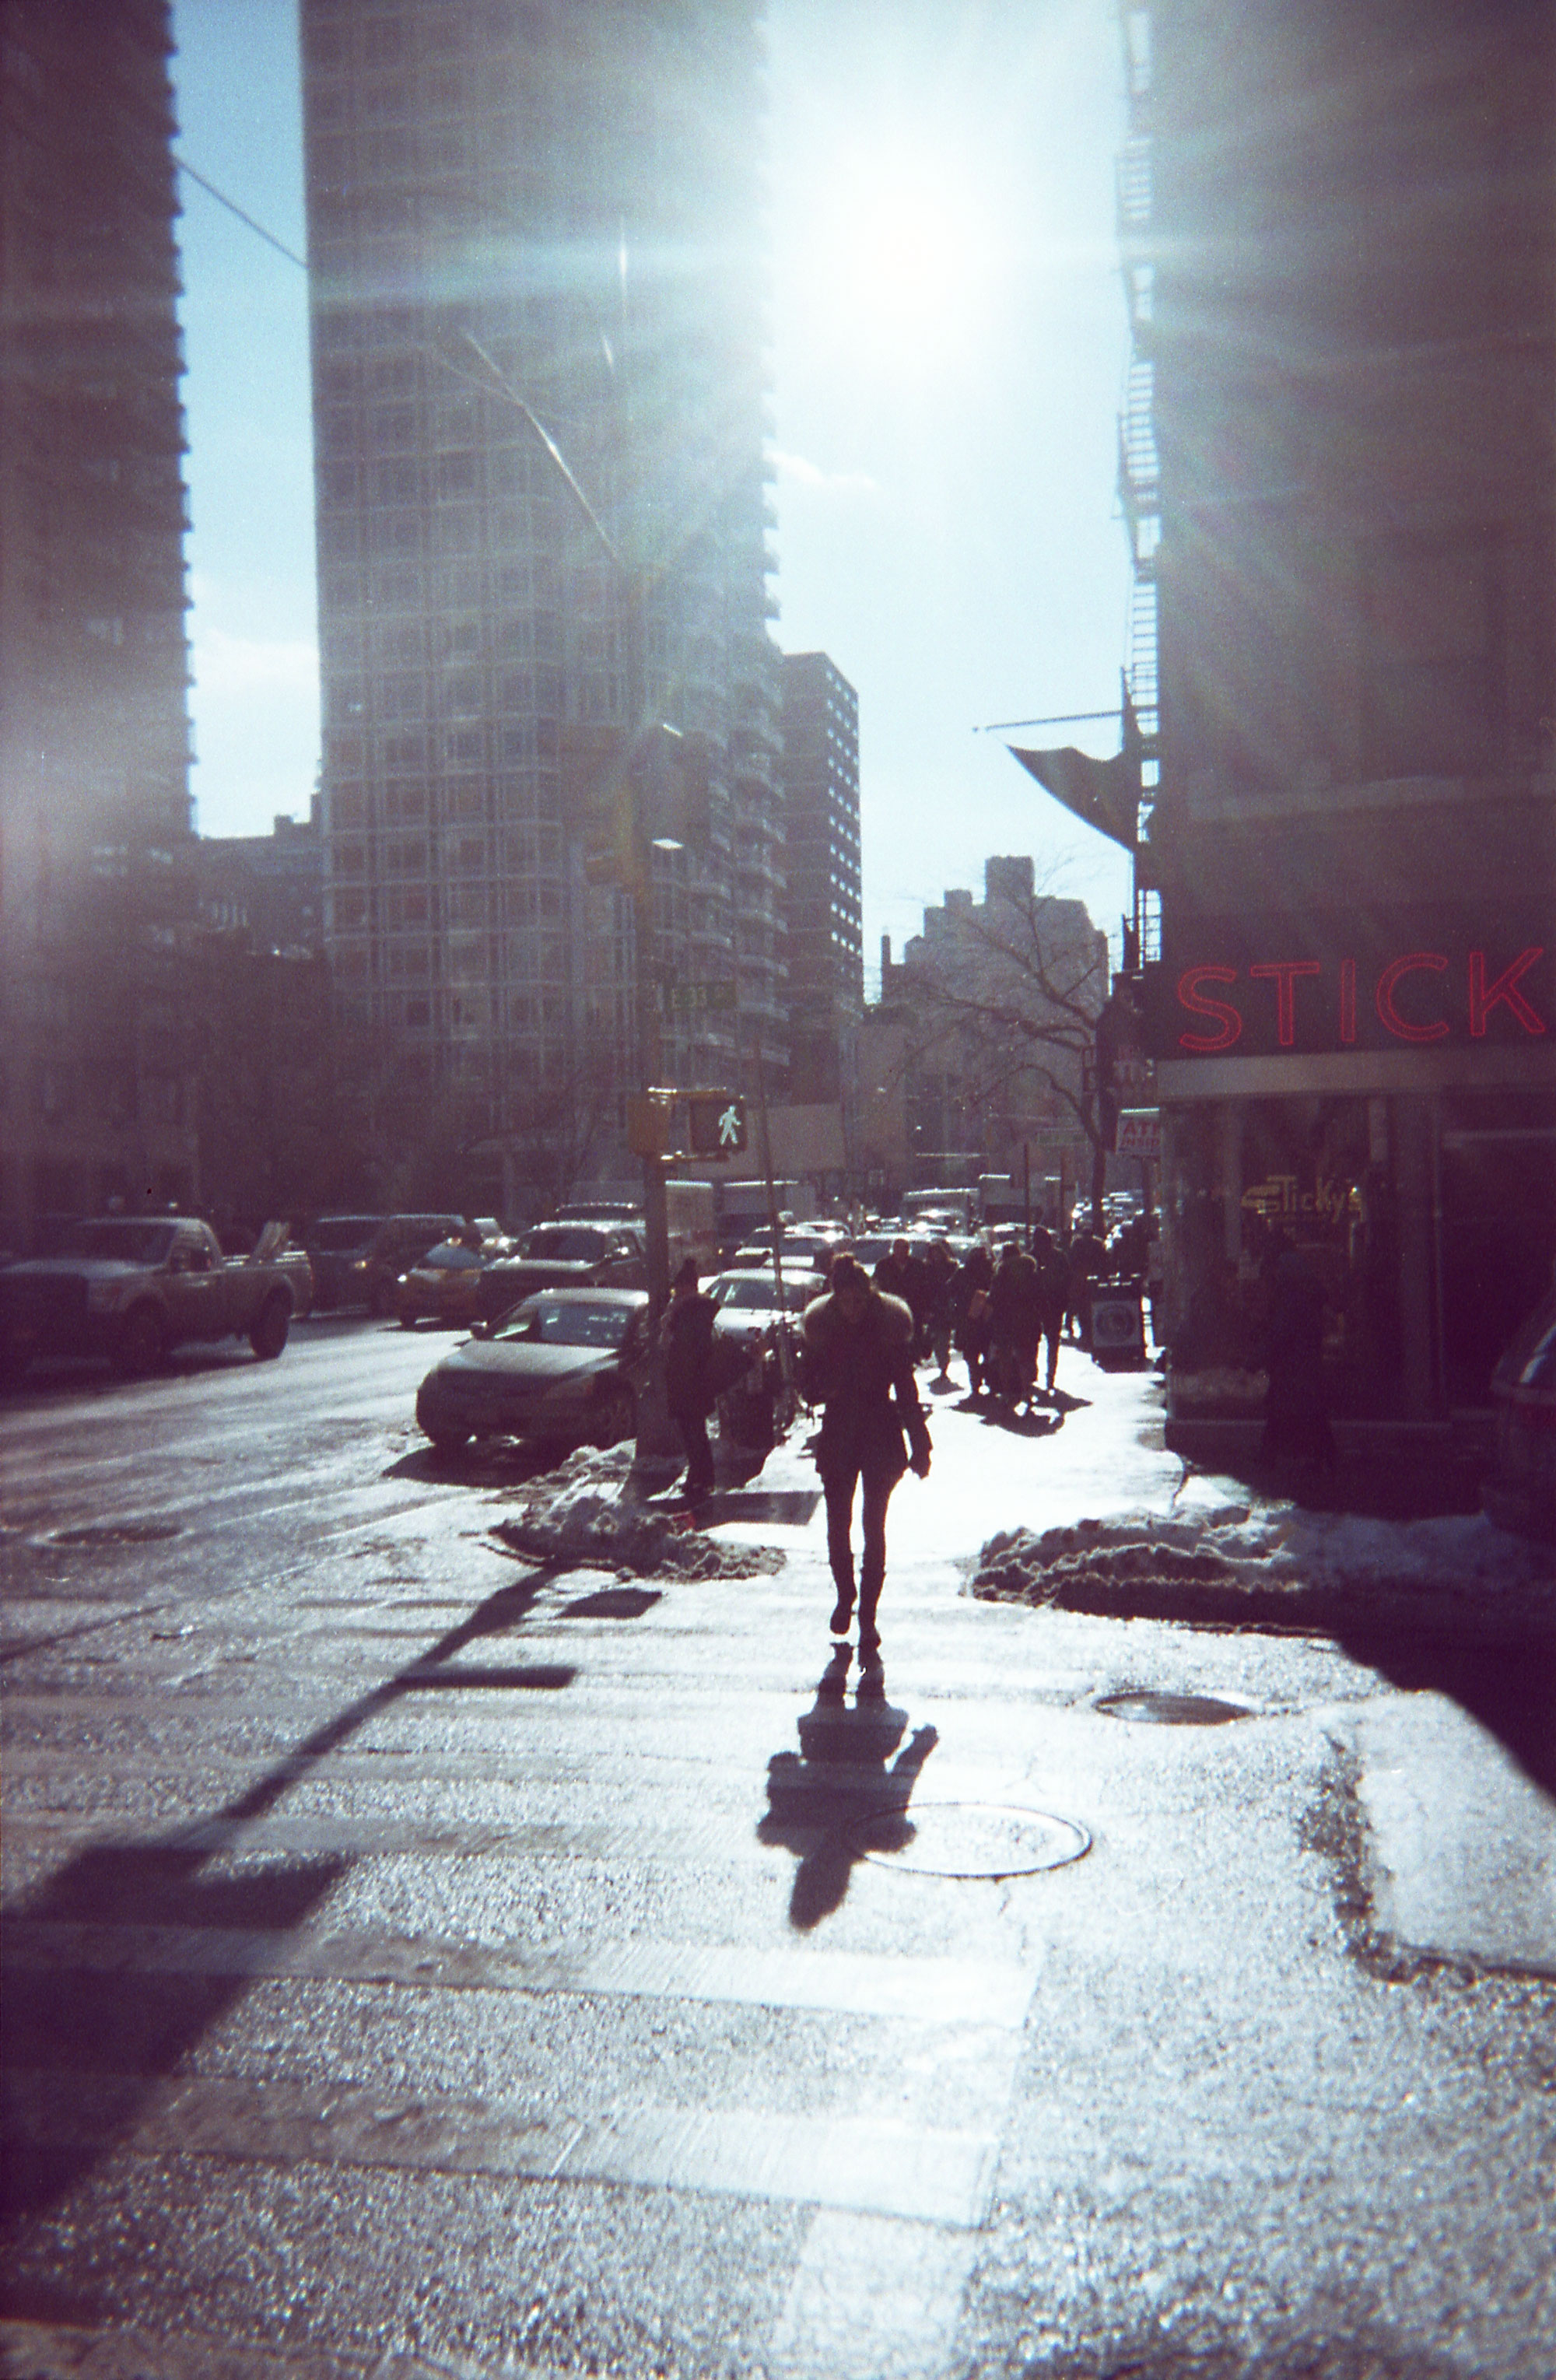 180104_GrayWedding_NYC_012.jpg